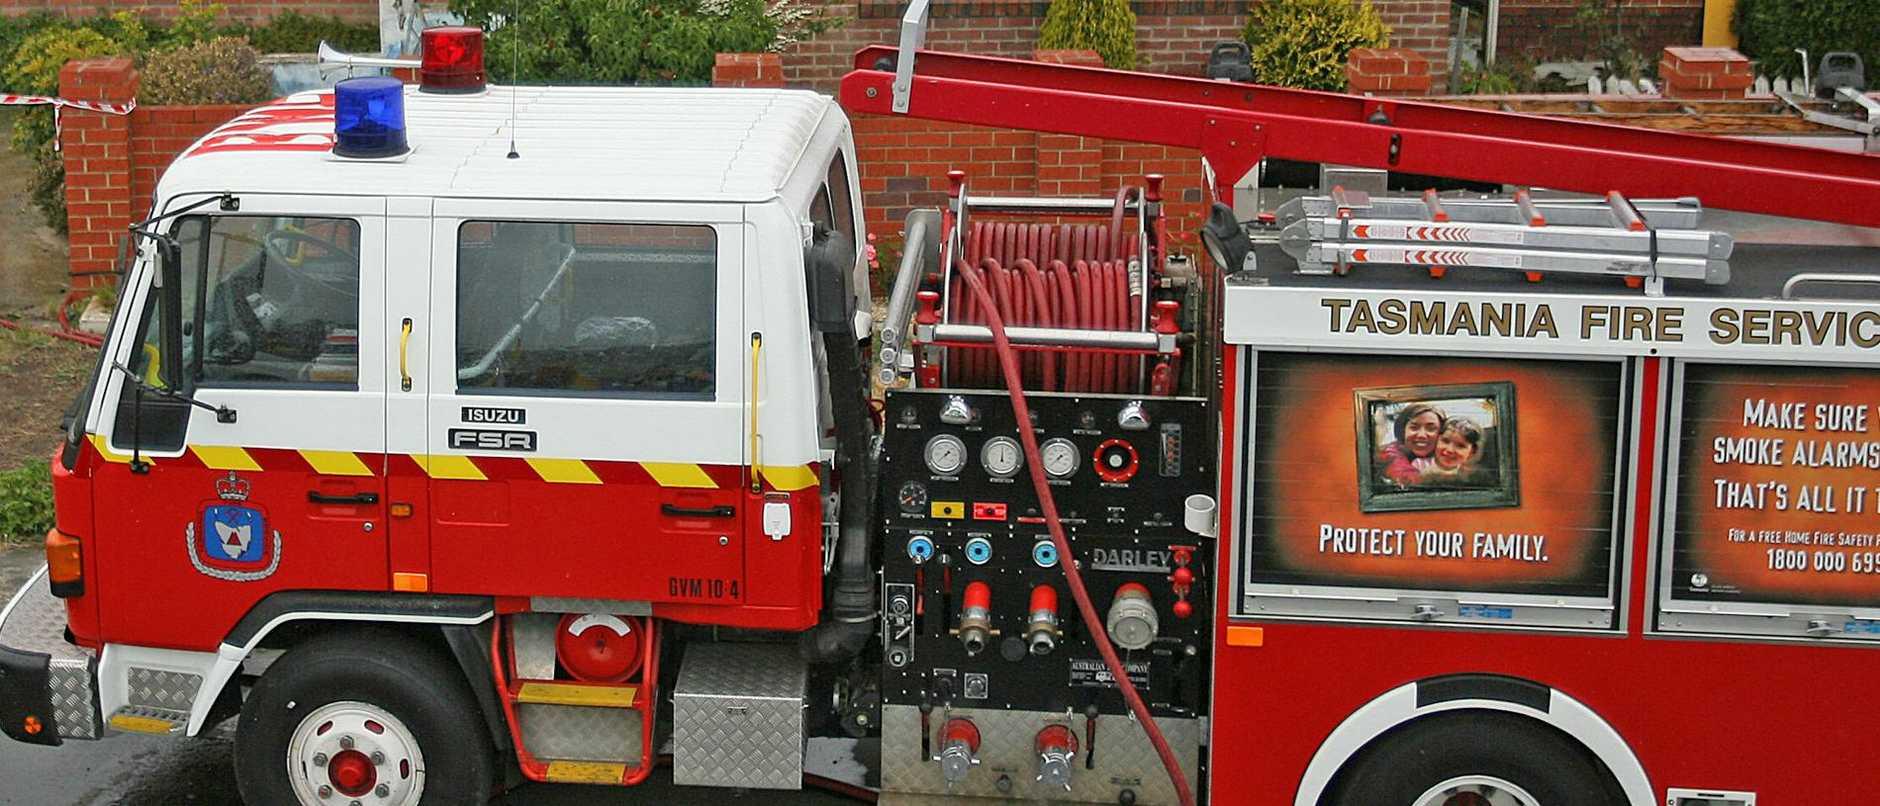 Fire truck, firetruck, file image